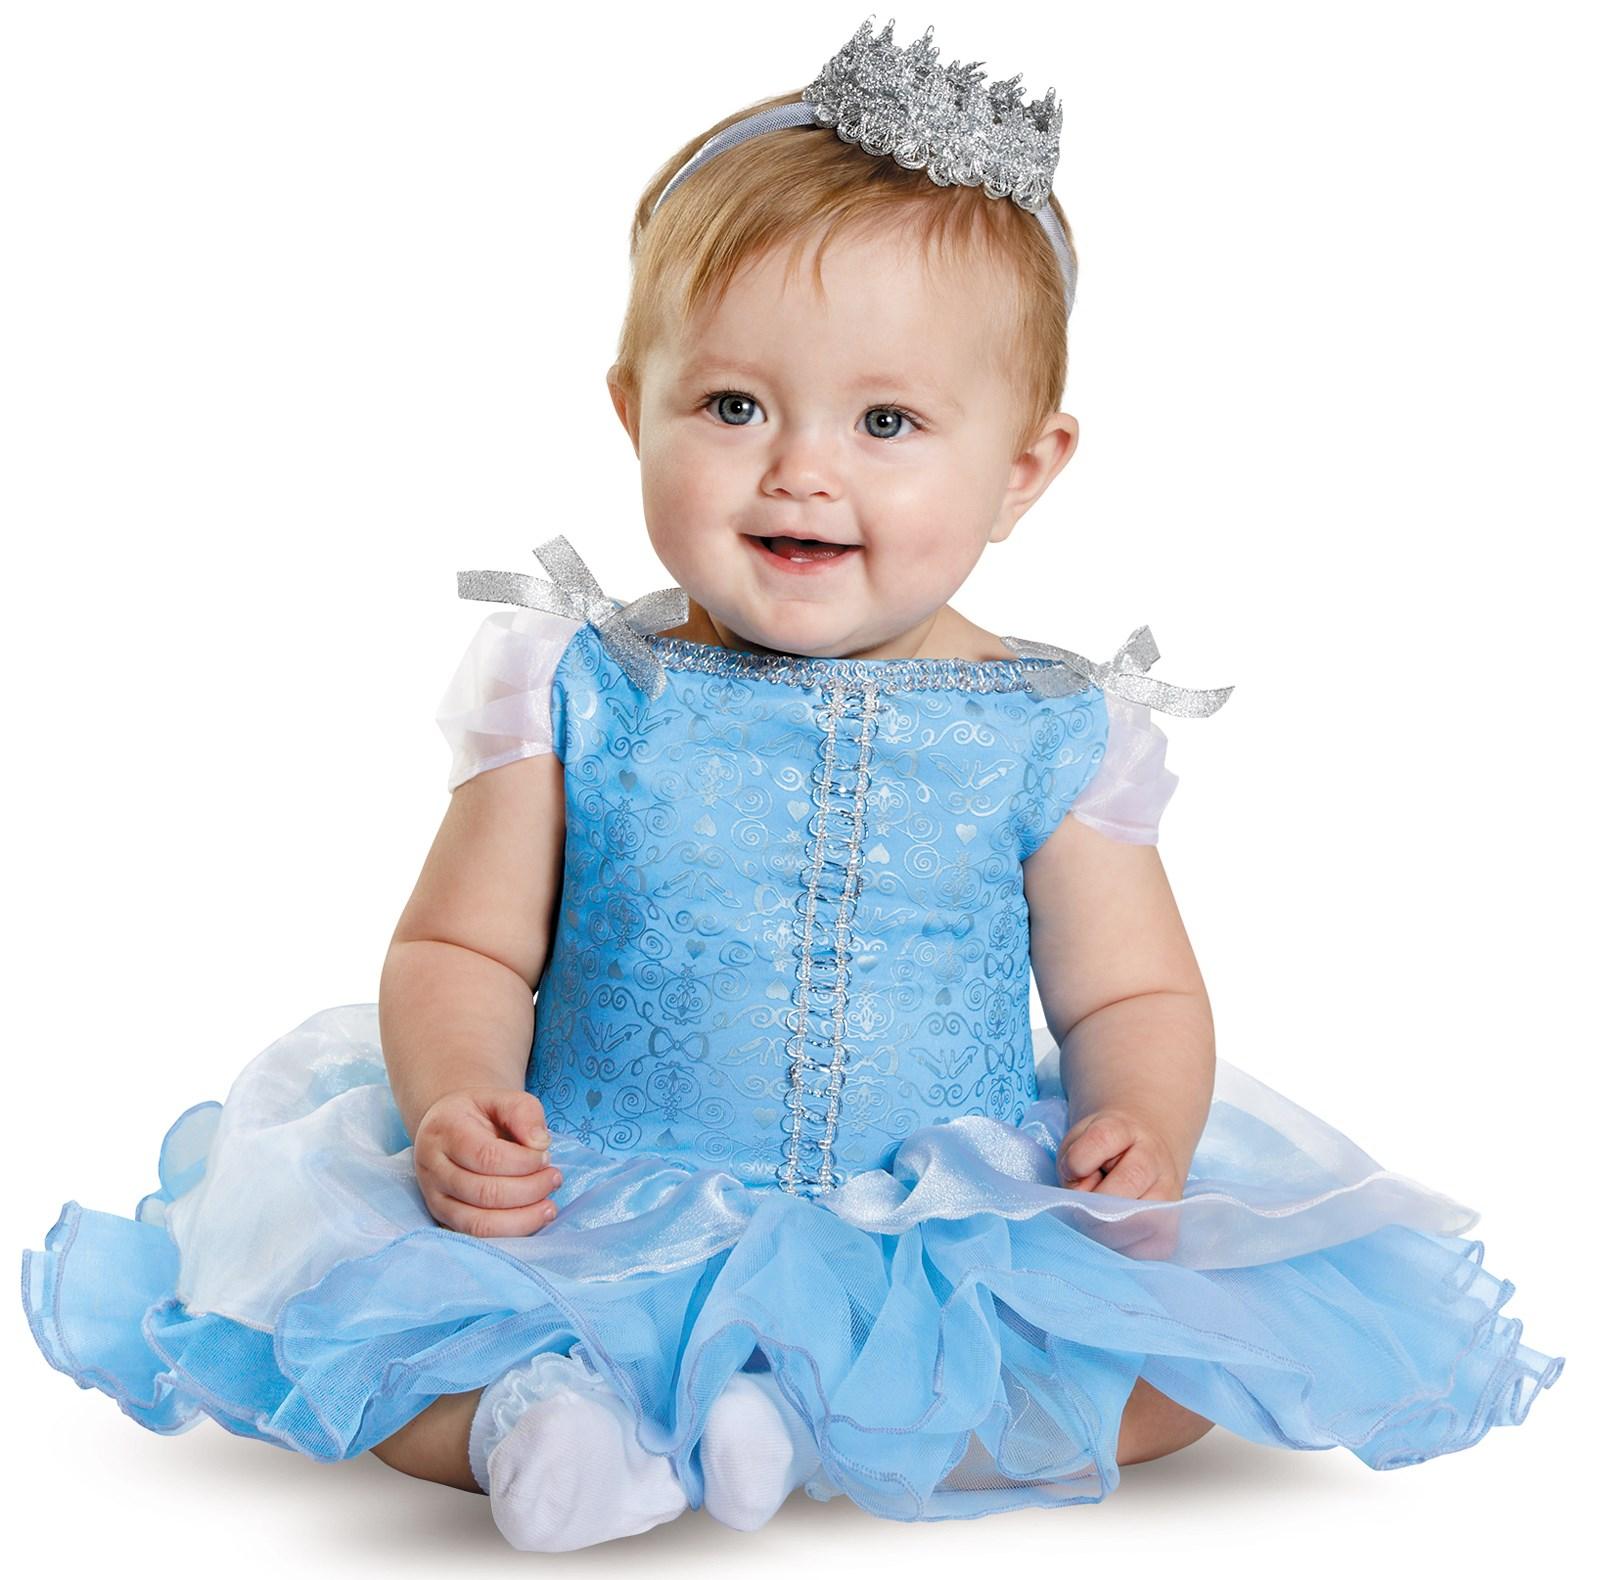 Disney Princess Cinderella Prestige Costume For Babies